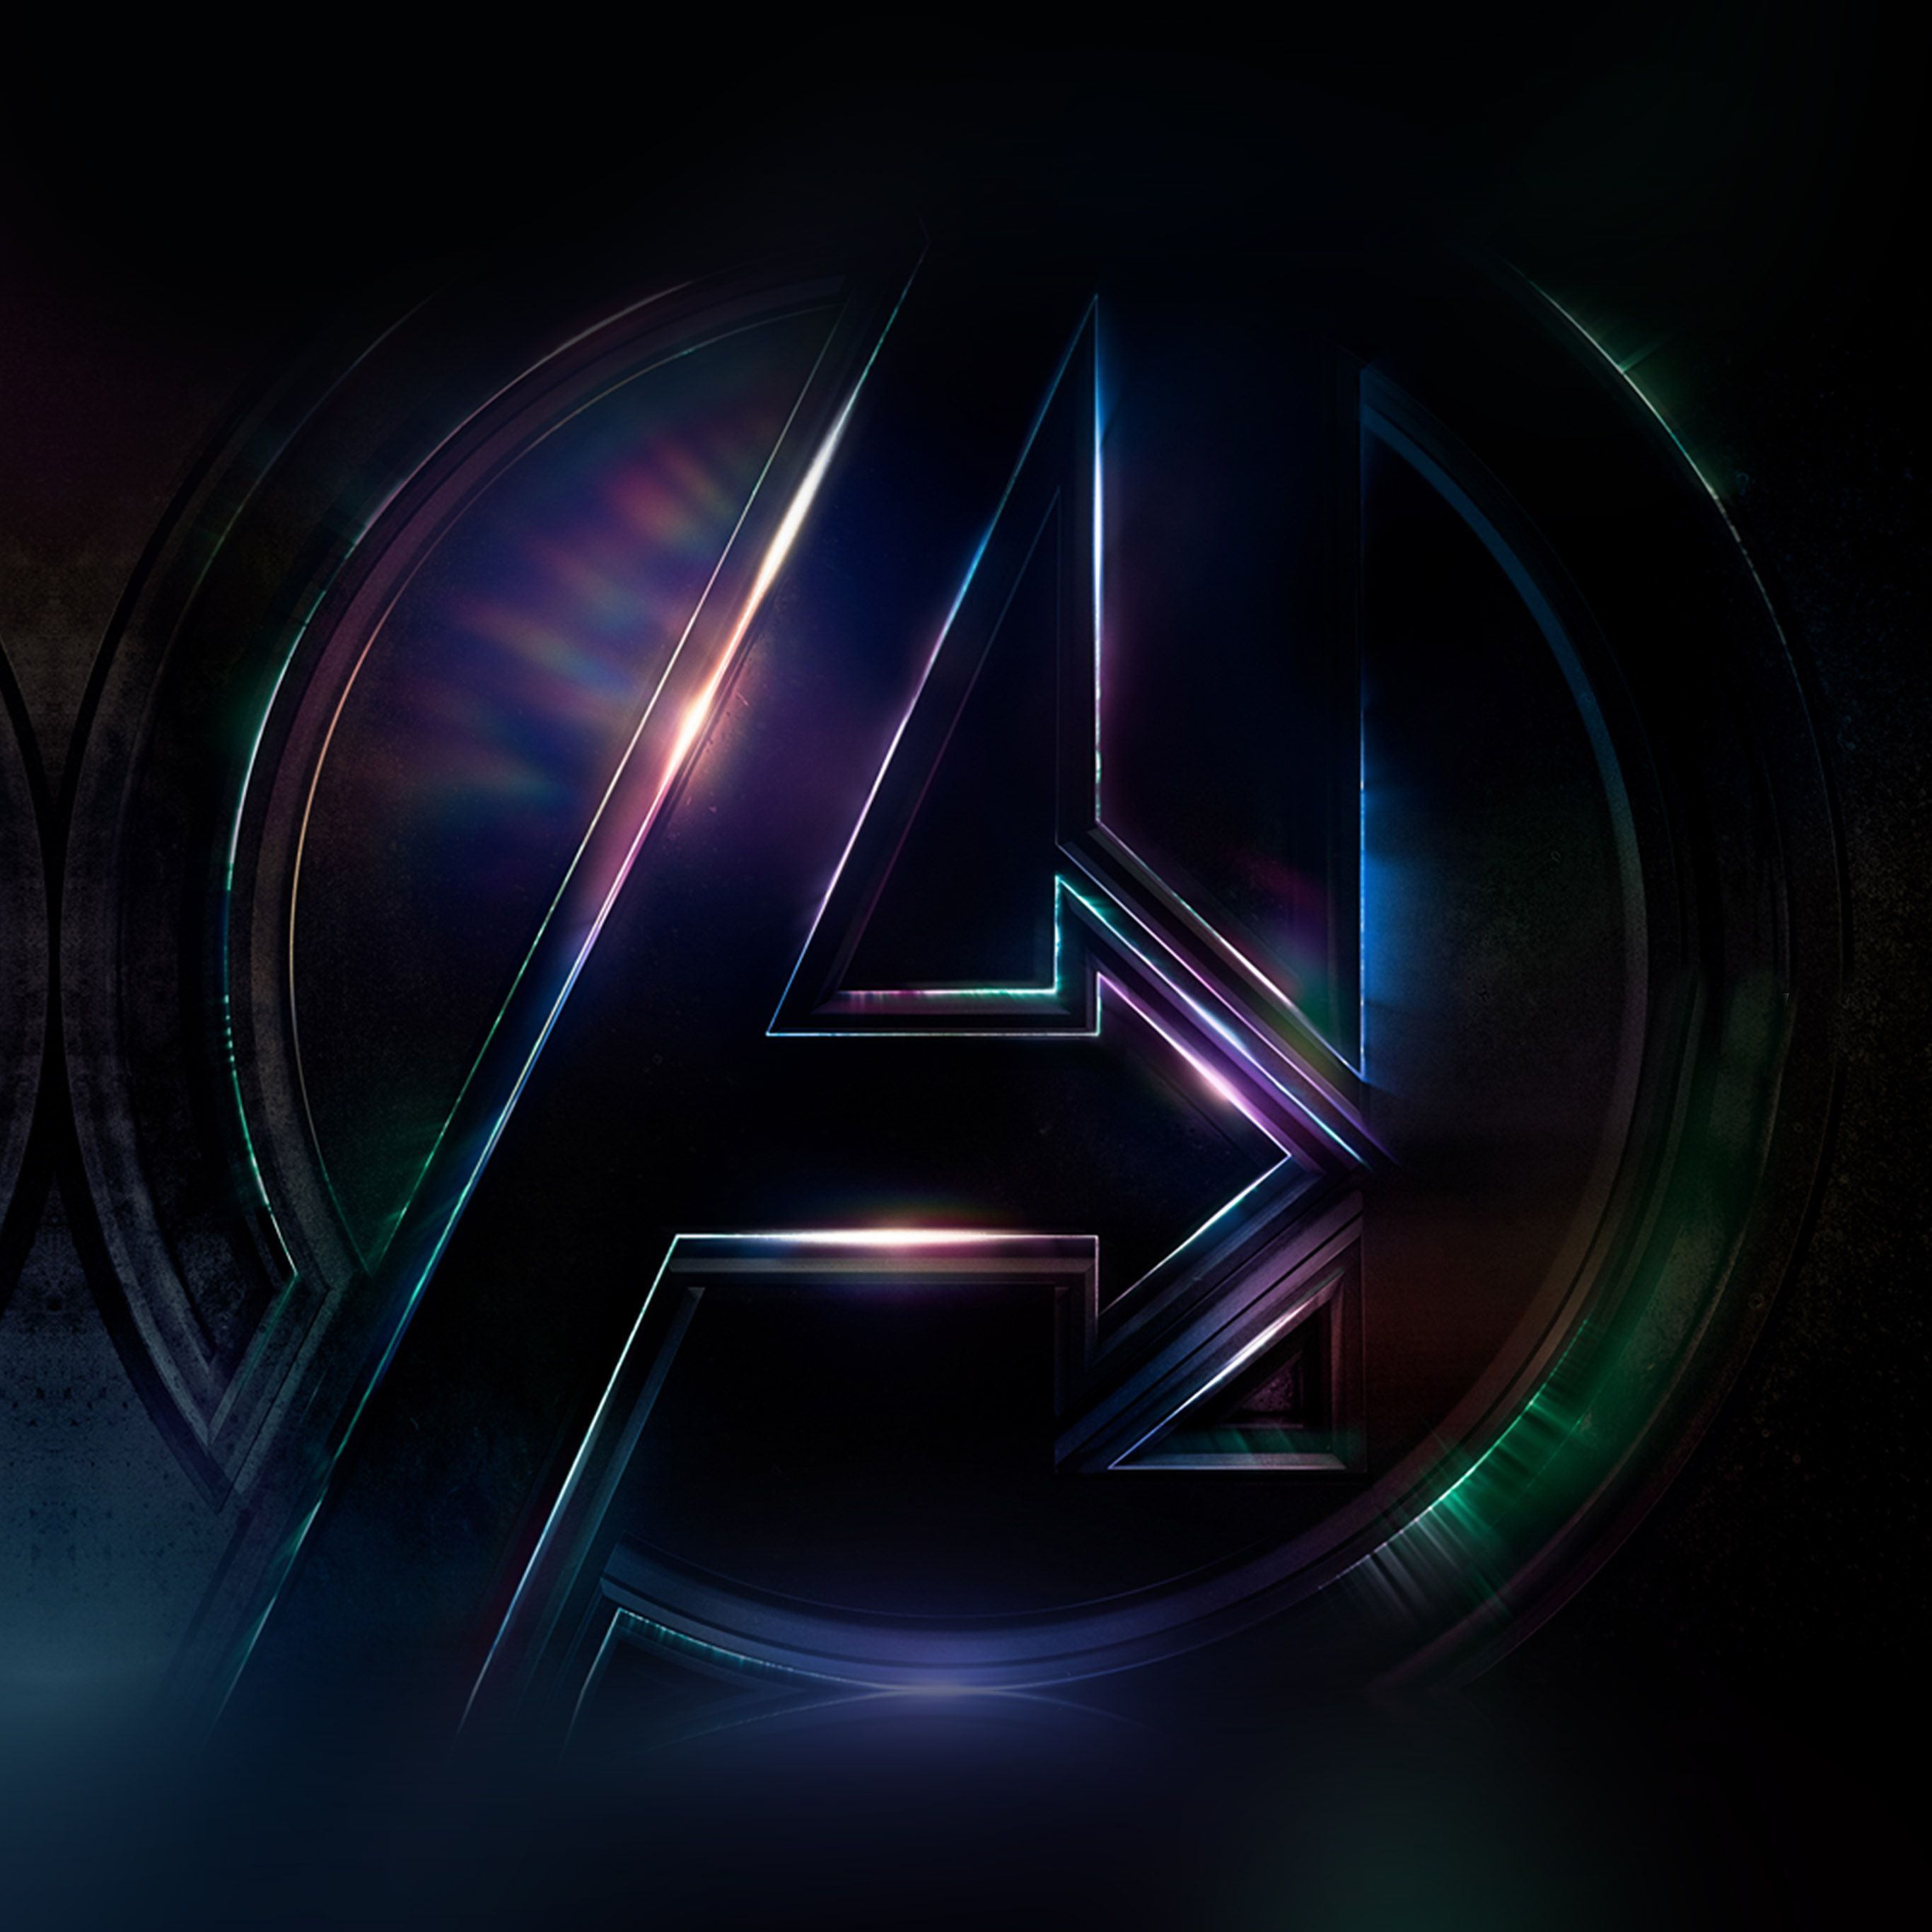 Marvel Avengers Logo Wallpapers Top Free Marvel Avengers Logo Backgrounds Wallpaperaccess Avengers Logo Avengers Wallpaper Film Art